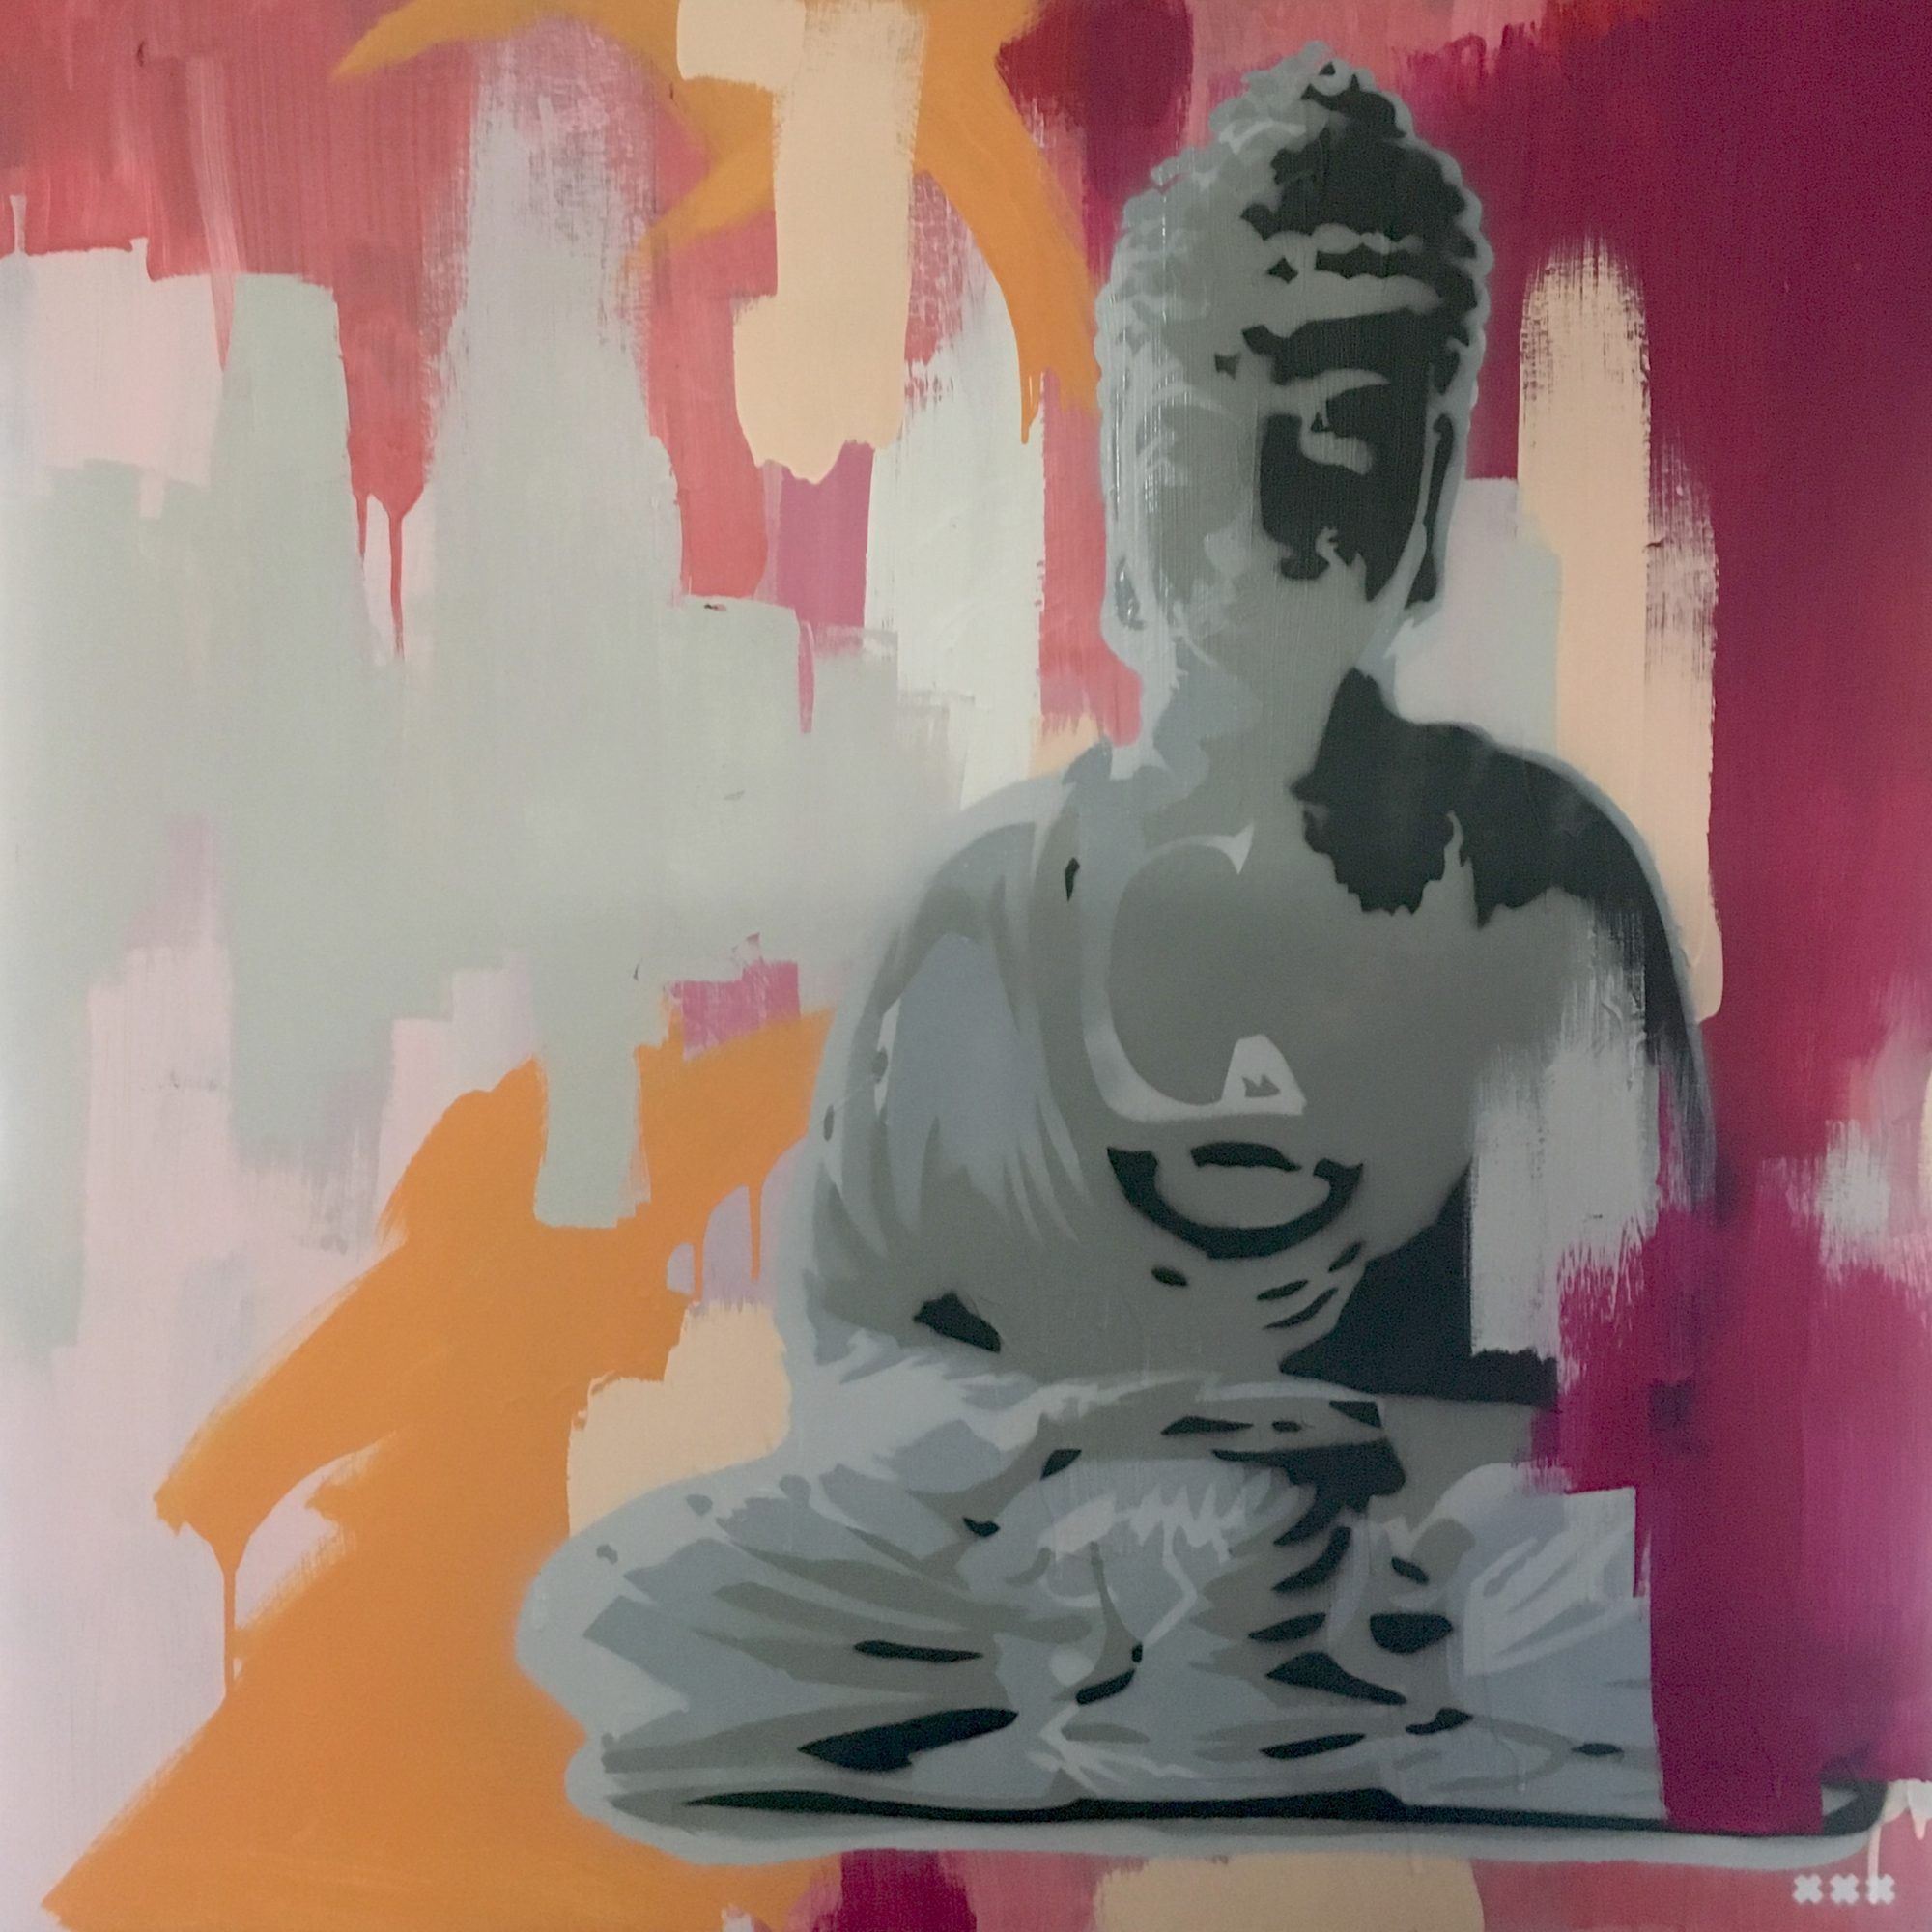 BuddhaPeach